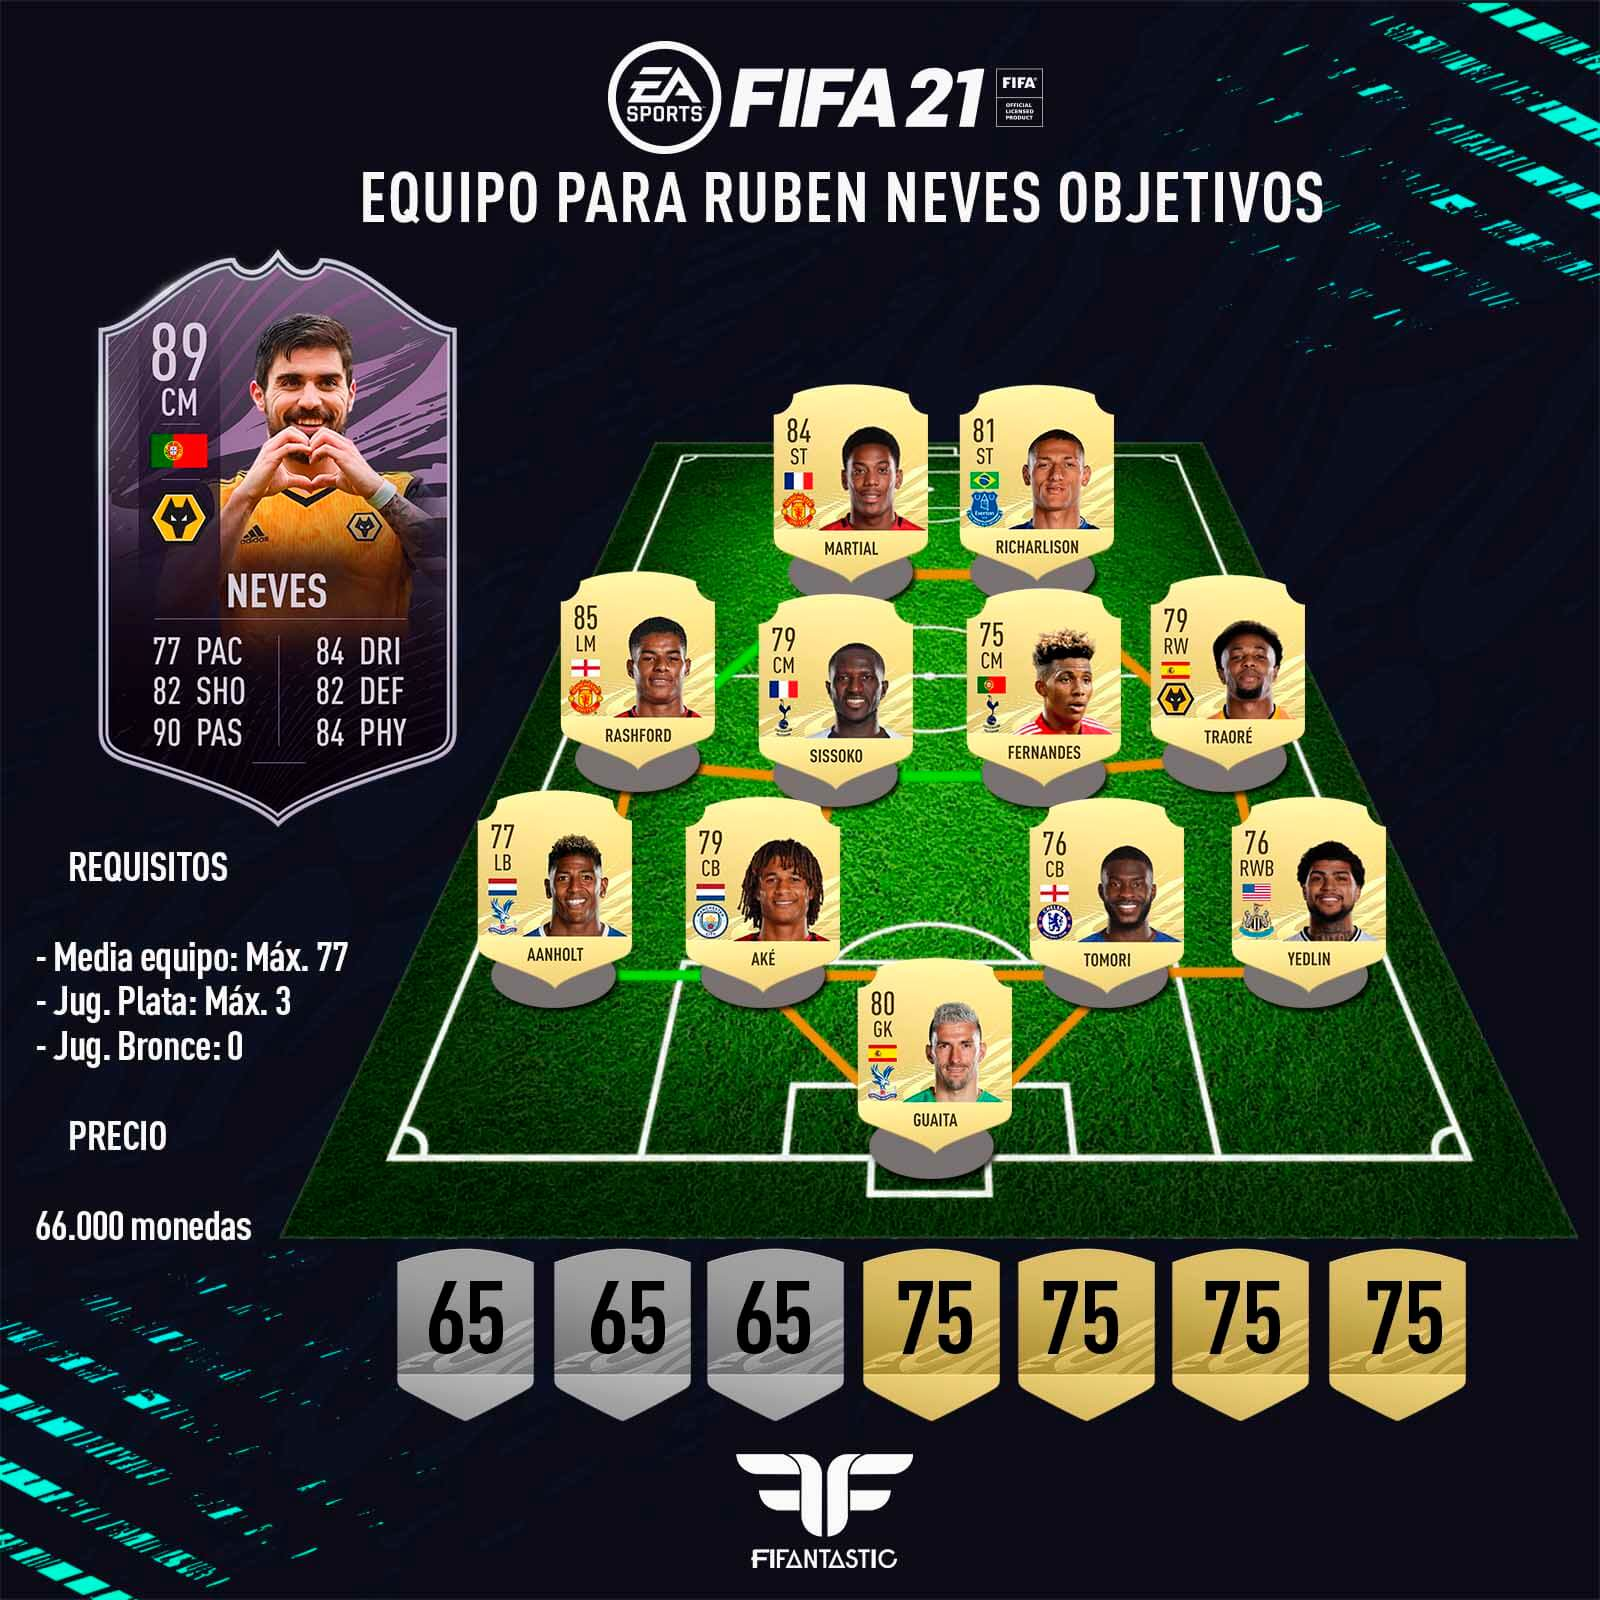 Ruben Neves Objetivos en FIFA 21 Ultimate Team